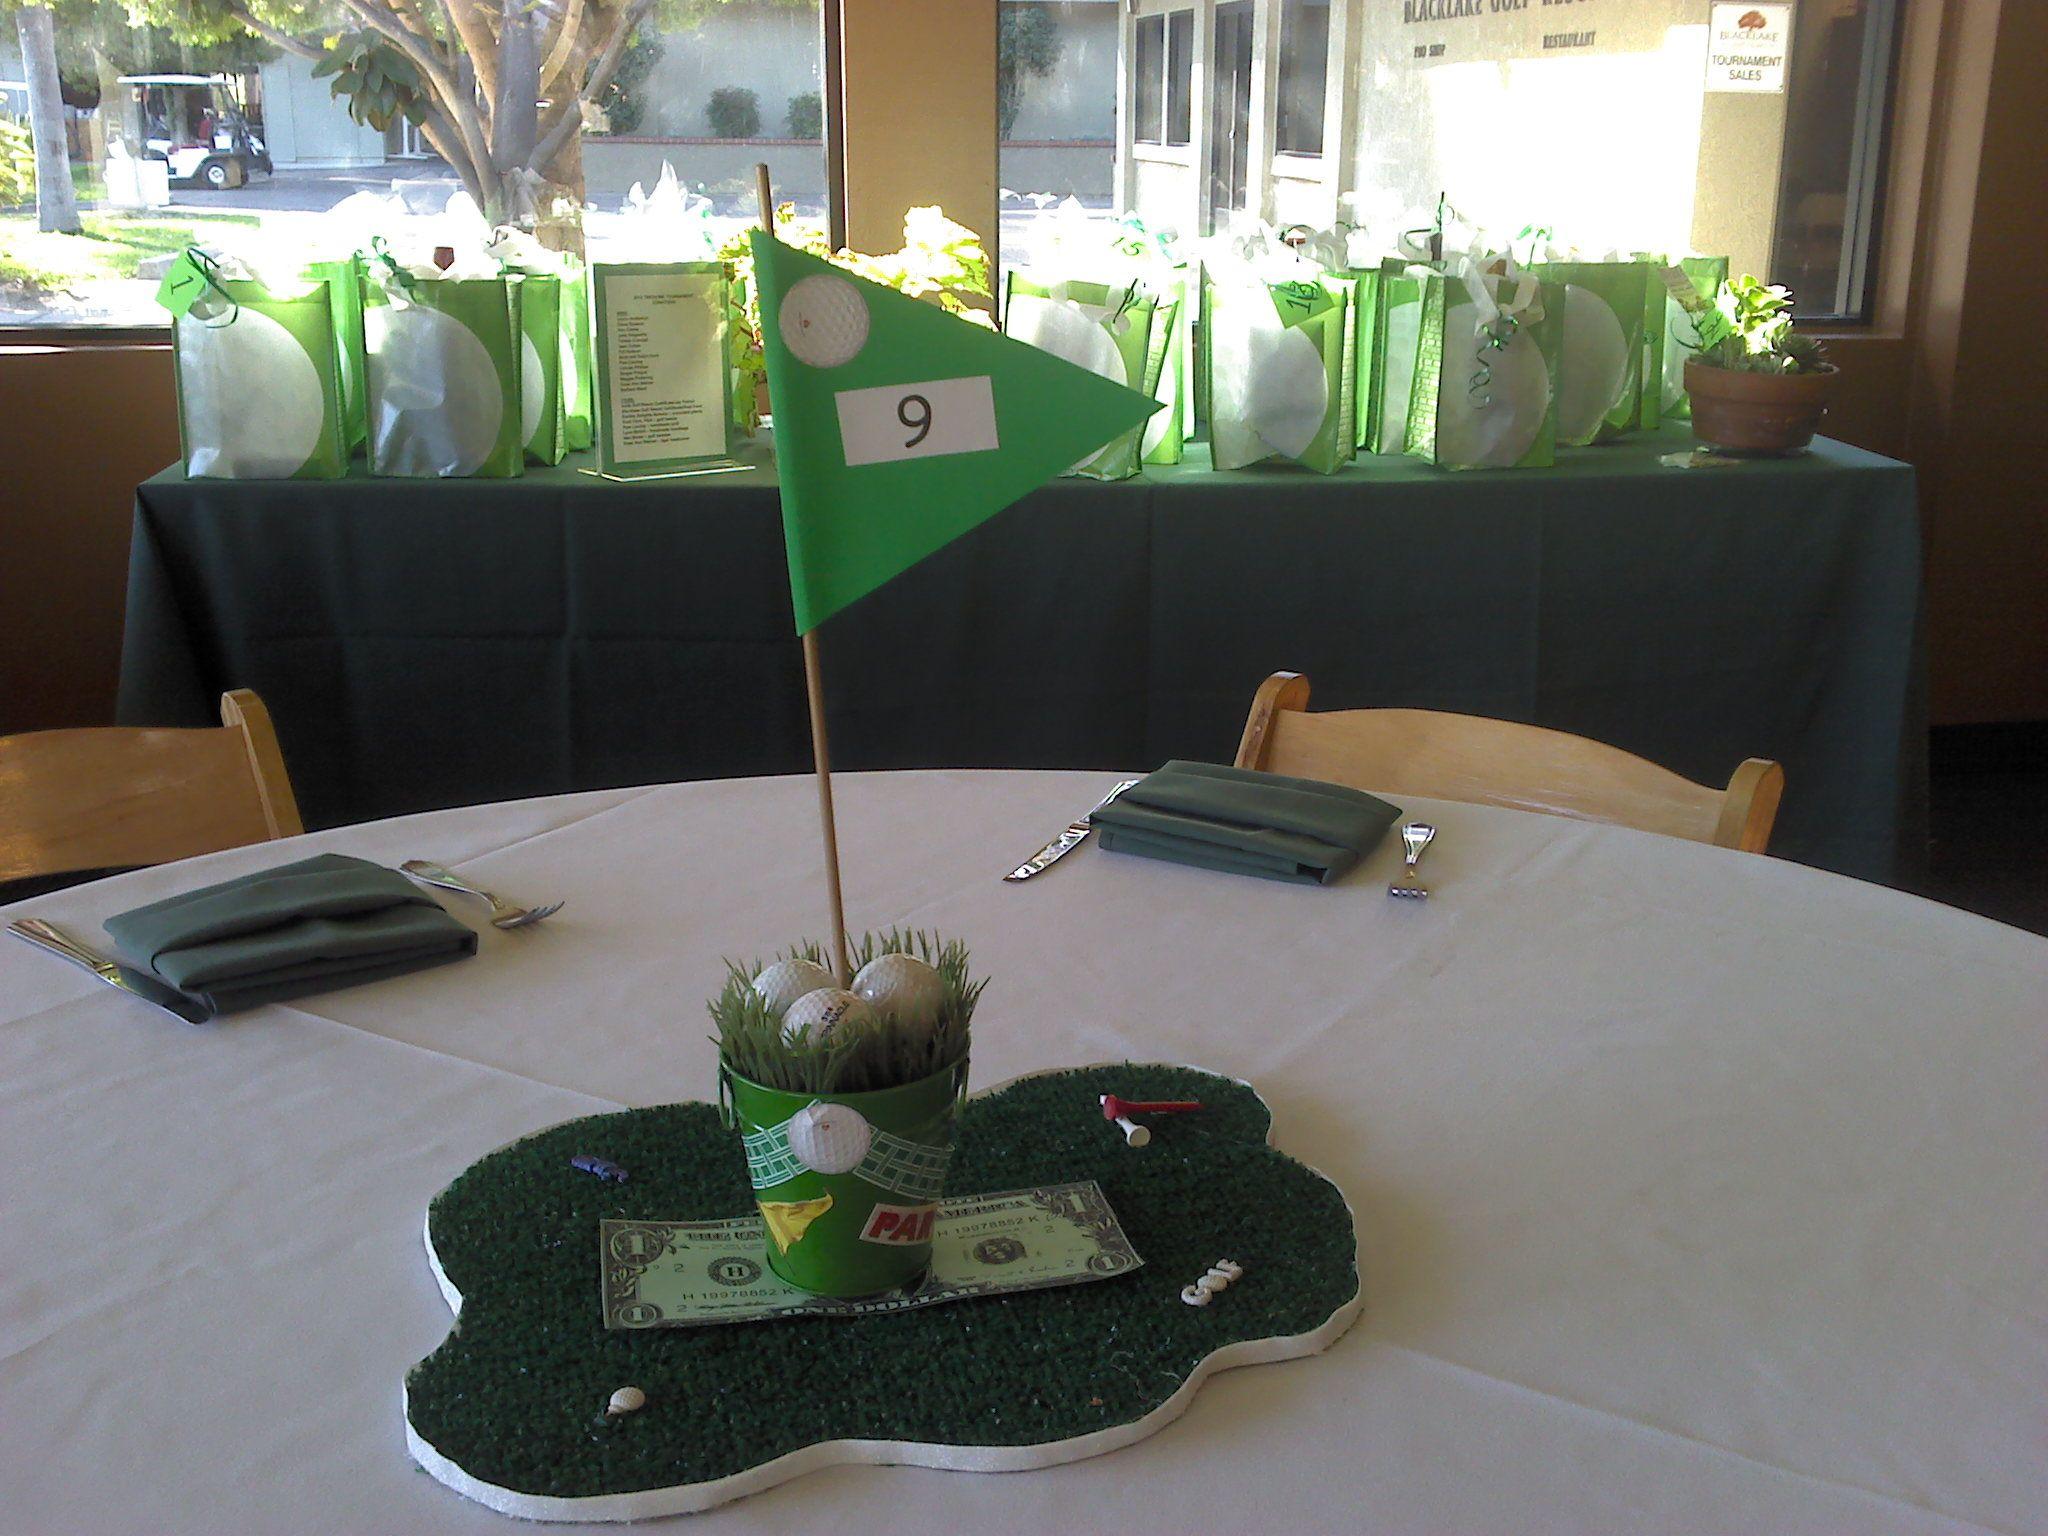 #Tournament Reception @ Blacklake Http://wp.me/s291tj